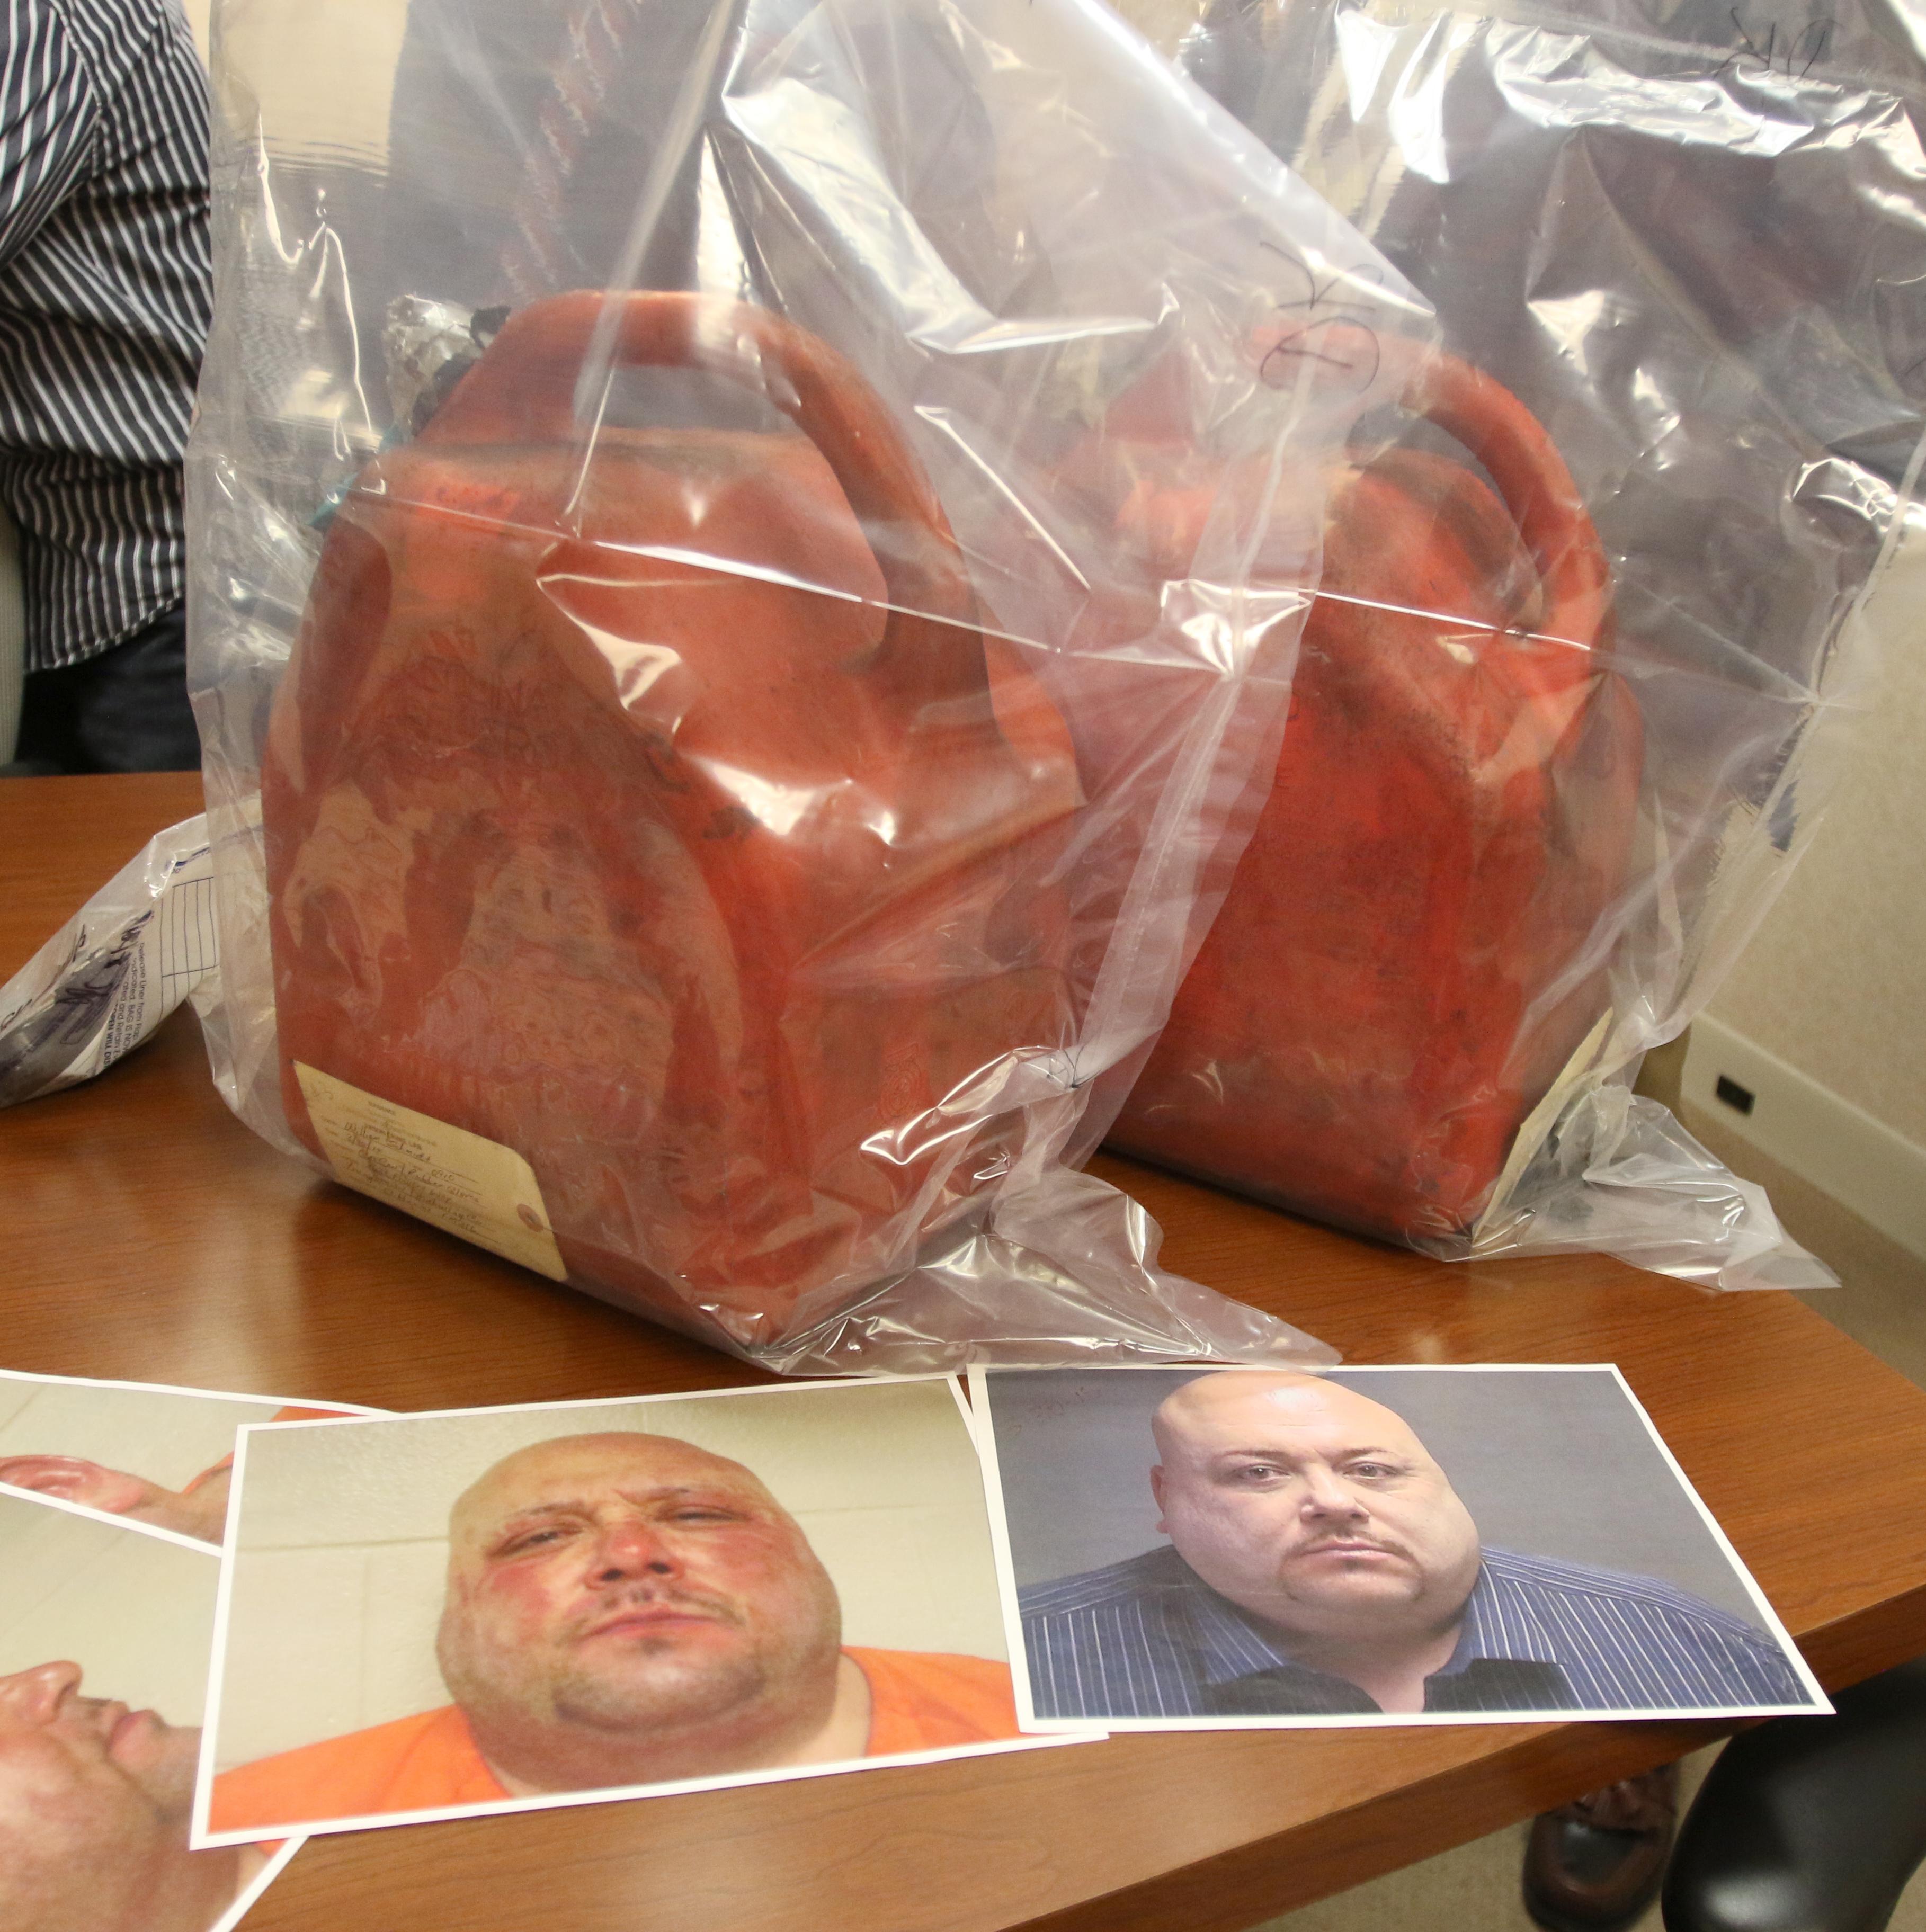 prosecutors discuss evidence in seman case